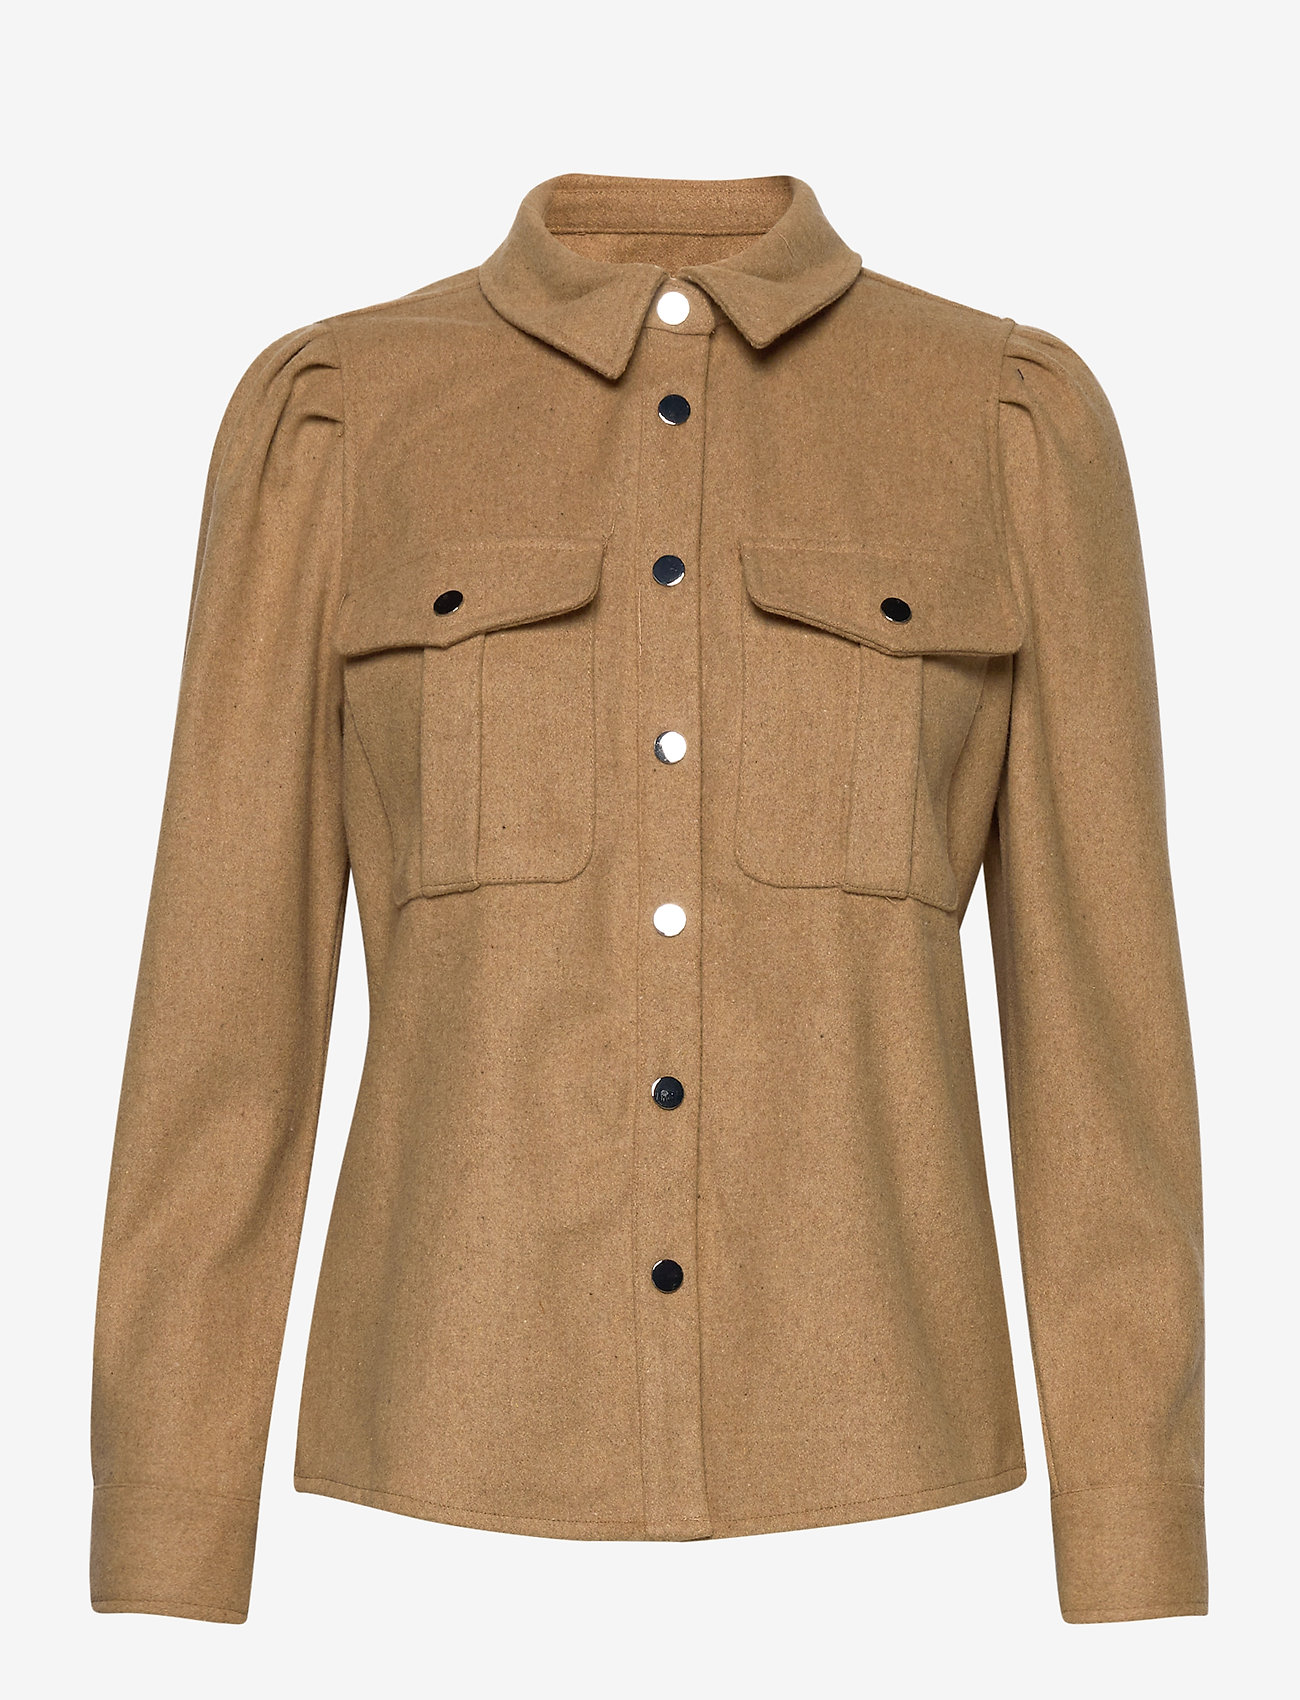 ONLY - ONLEILENA-VARI L/S PUFF SHIRT PNT - overshirts - curds & whey - 0